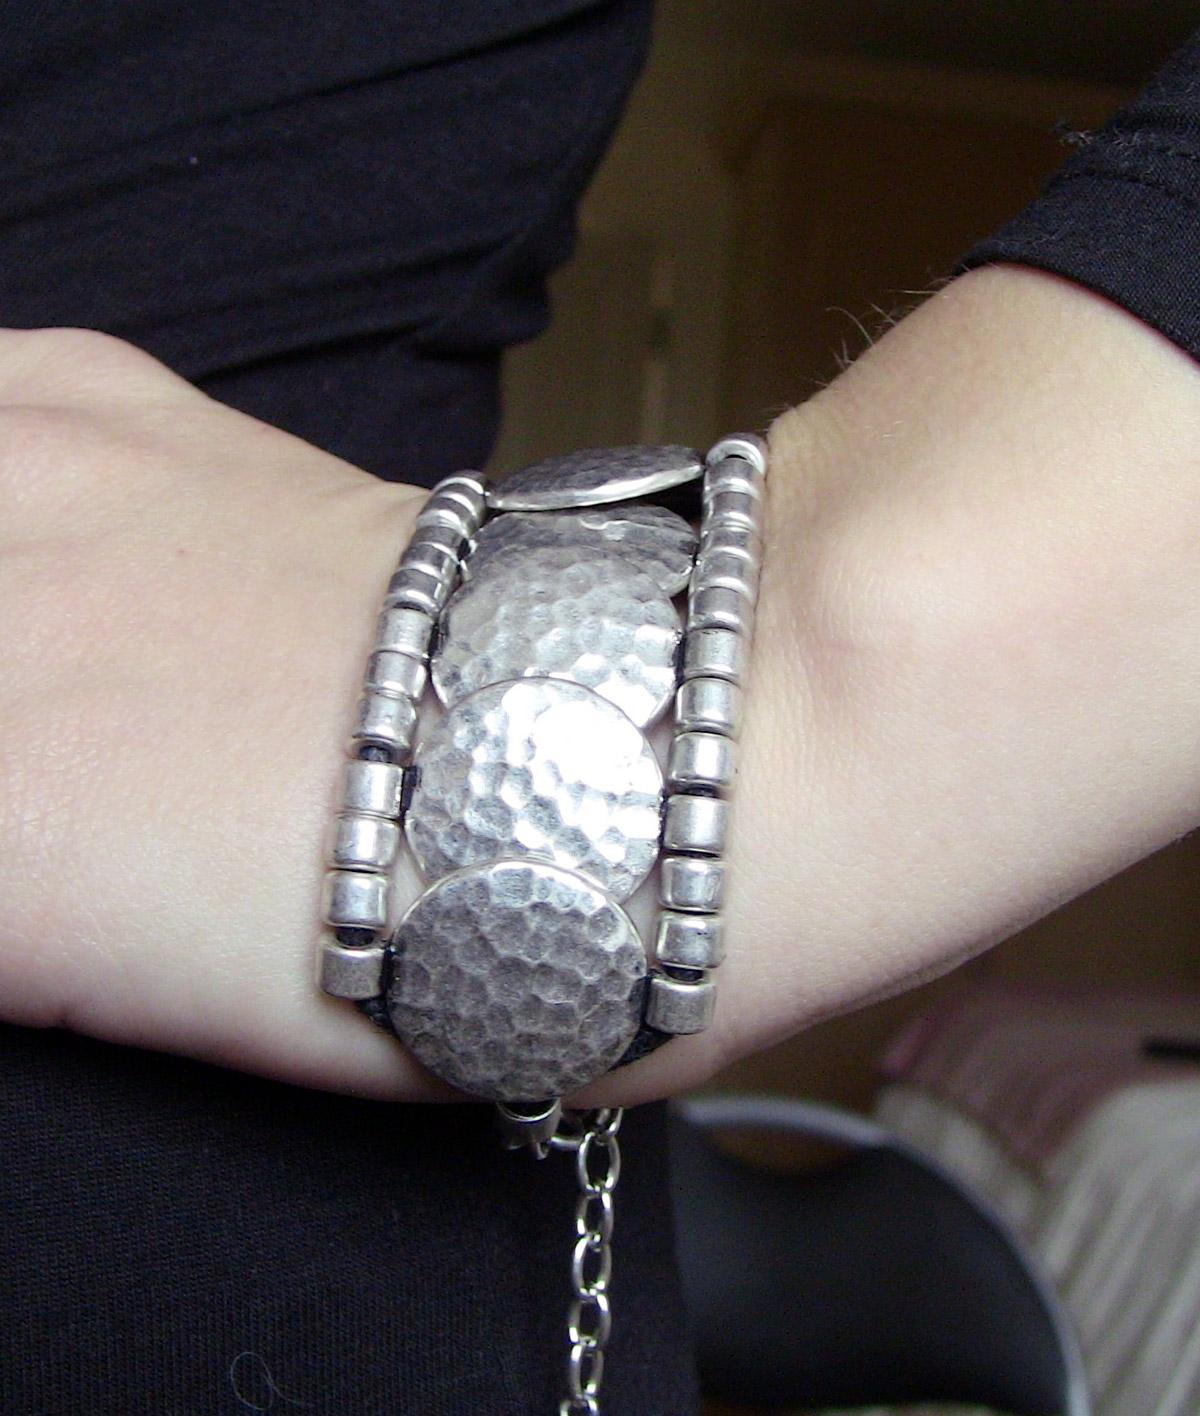 http://1.bp.blogspot.com/-KwWNXdjcMZU/TcAM9ujF9YI/AAAAAAAAHSc/o1j2lwh6b-I/s1600/Mumbai-Bracelet.jpg